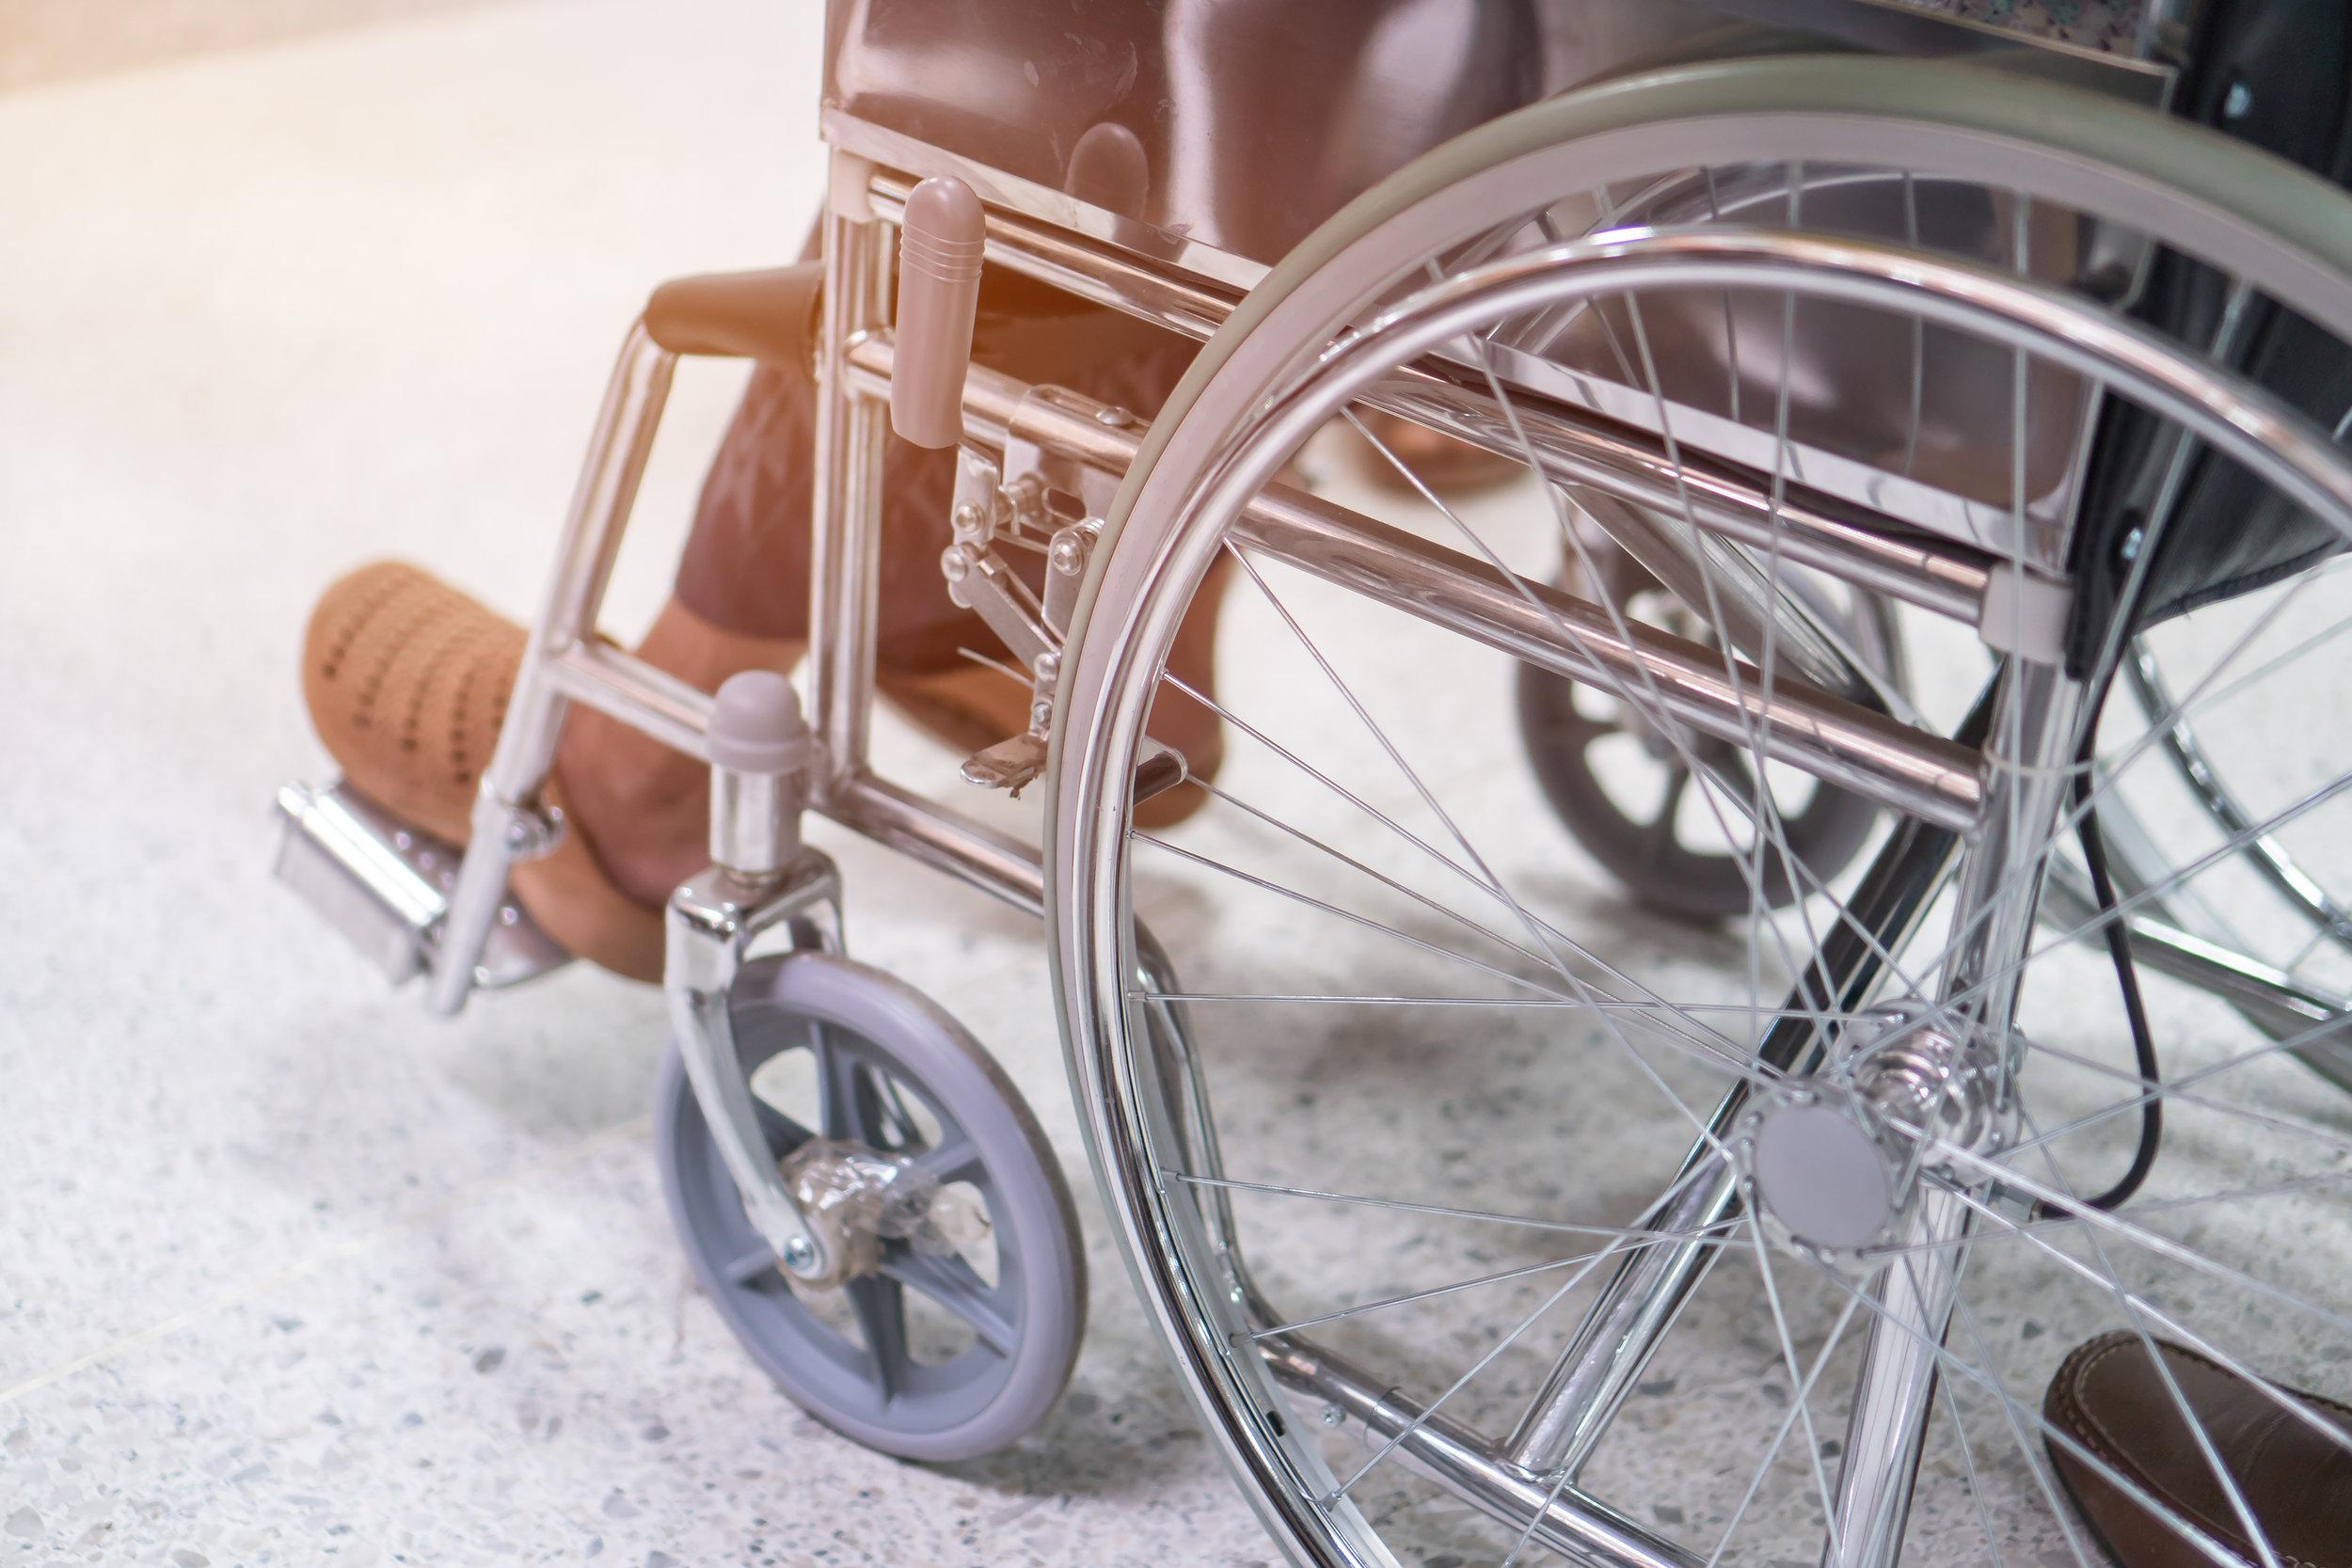 bigstock-Disabled-Older-Patient-Sitting-287398975.jpg